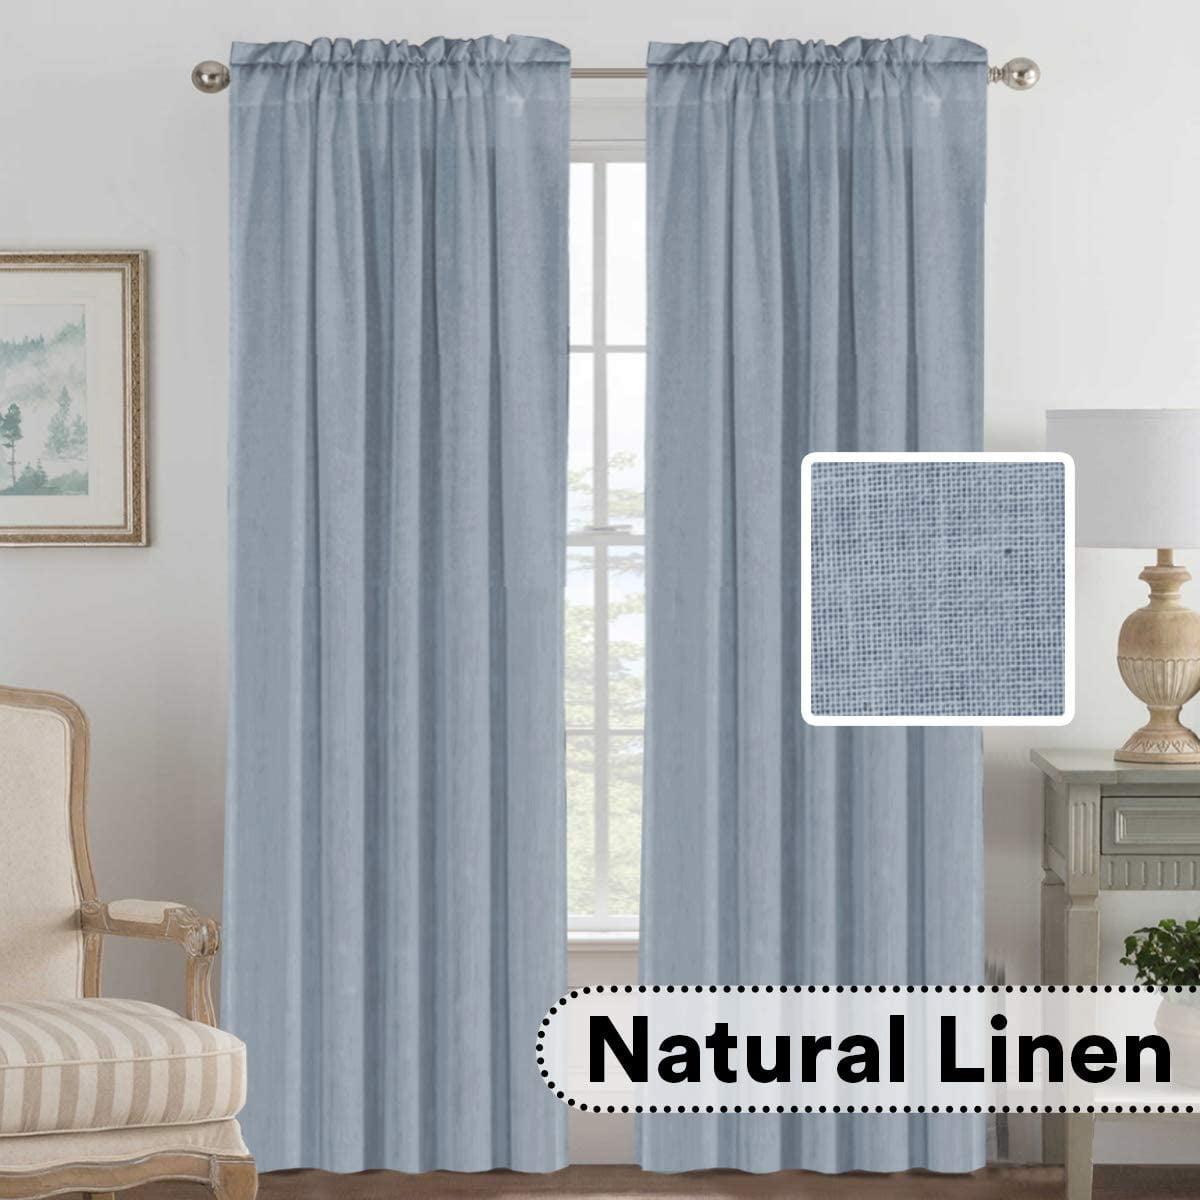 Linen Curtains Elegant Natural Linen Blended Curtains Energy Efficient Light Filtering Rod Pocket Window Treatments Panels Drapes For Livingroom Set Of 2 Stone Blue 52 X 84 Walmart Com Walmart Com